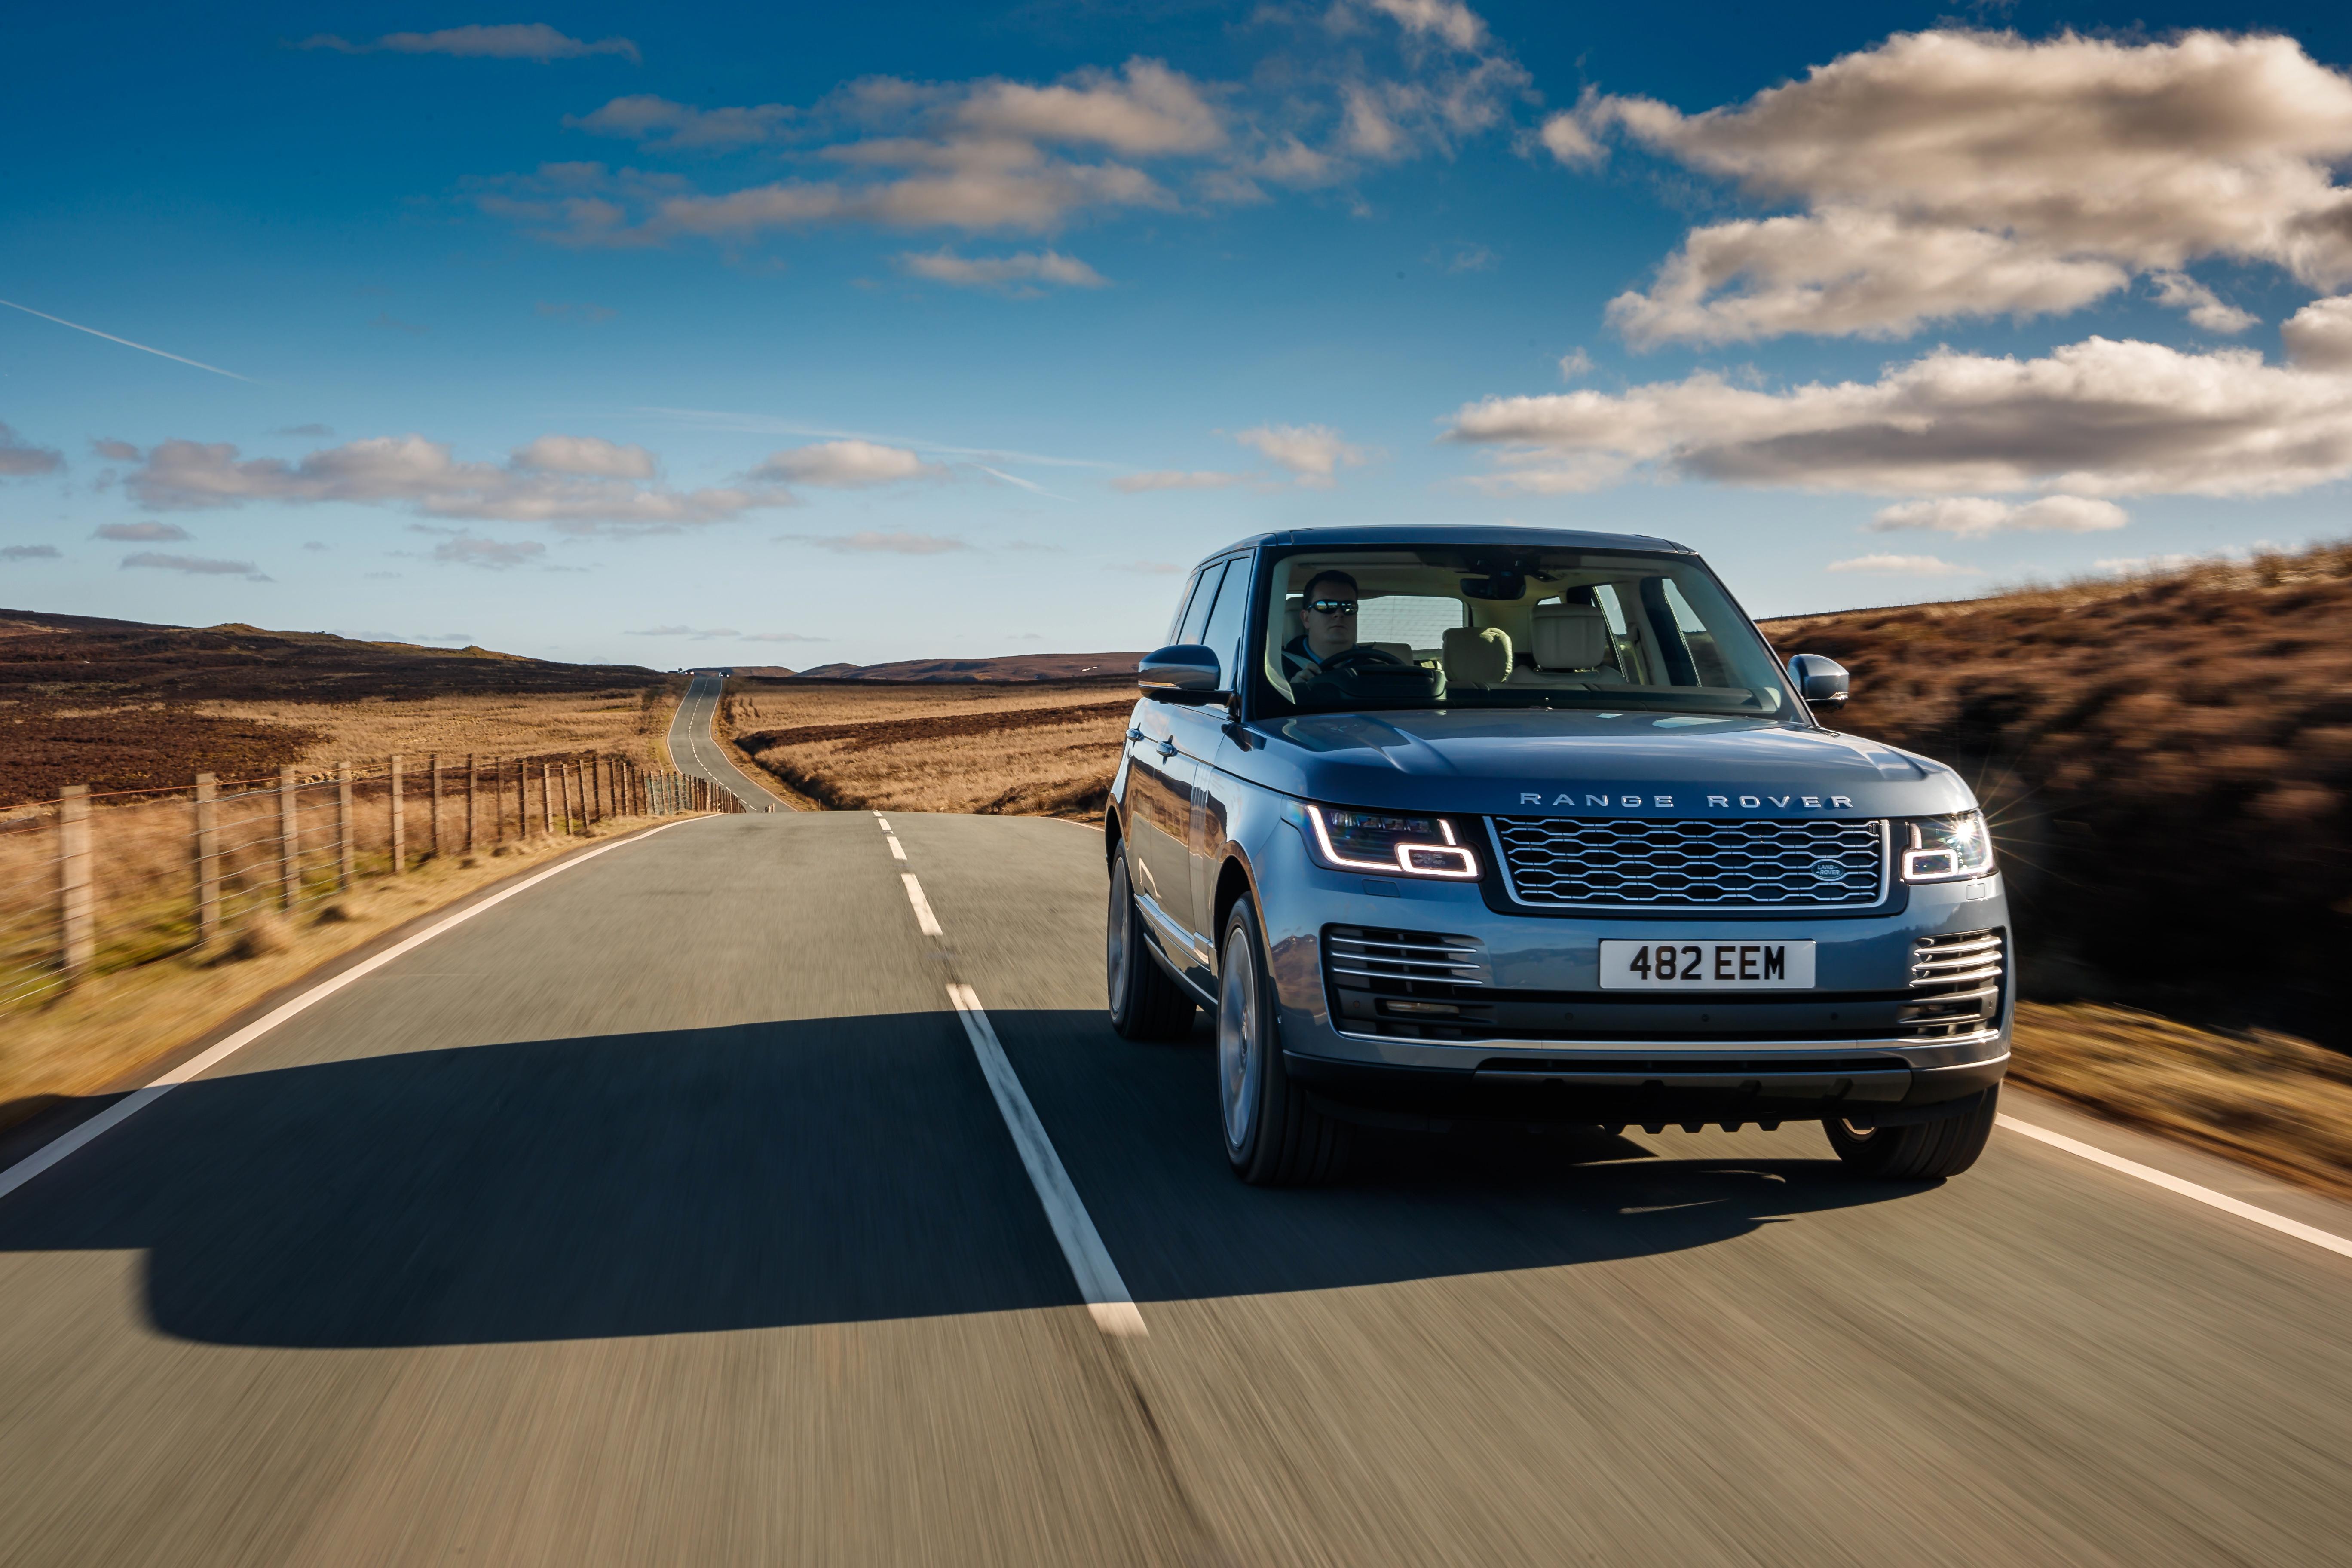 2018 Range Rover PHEV new car review